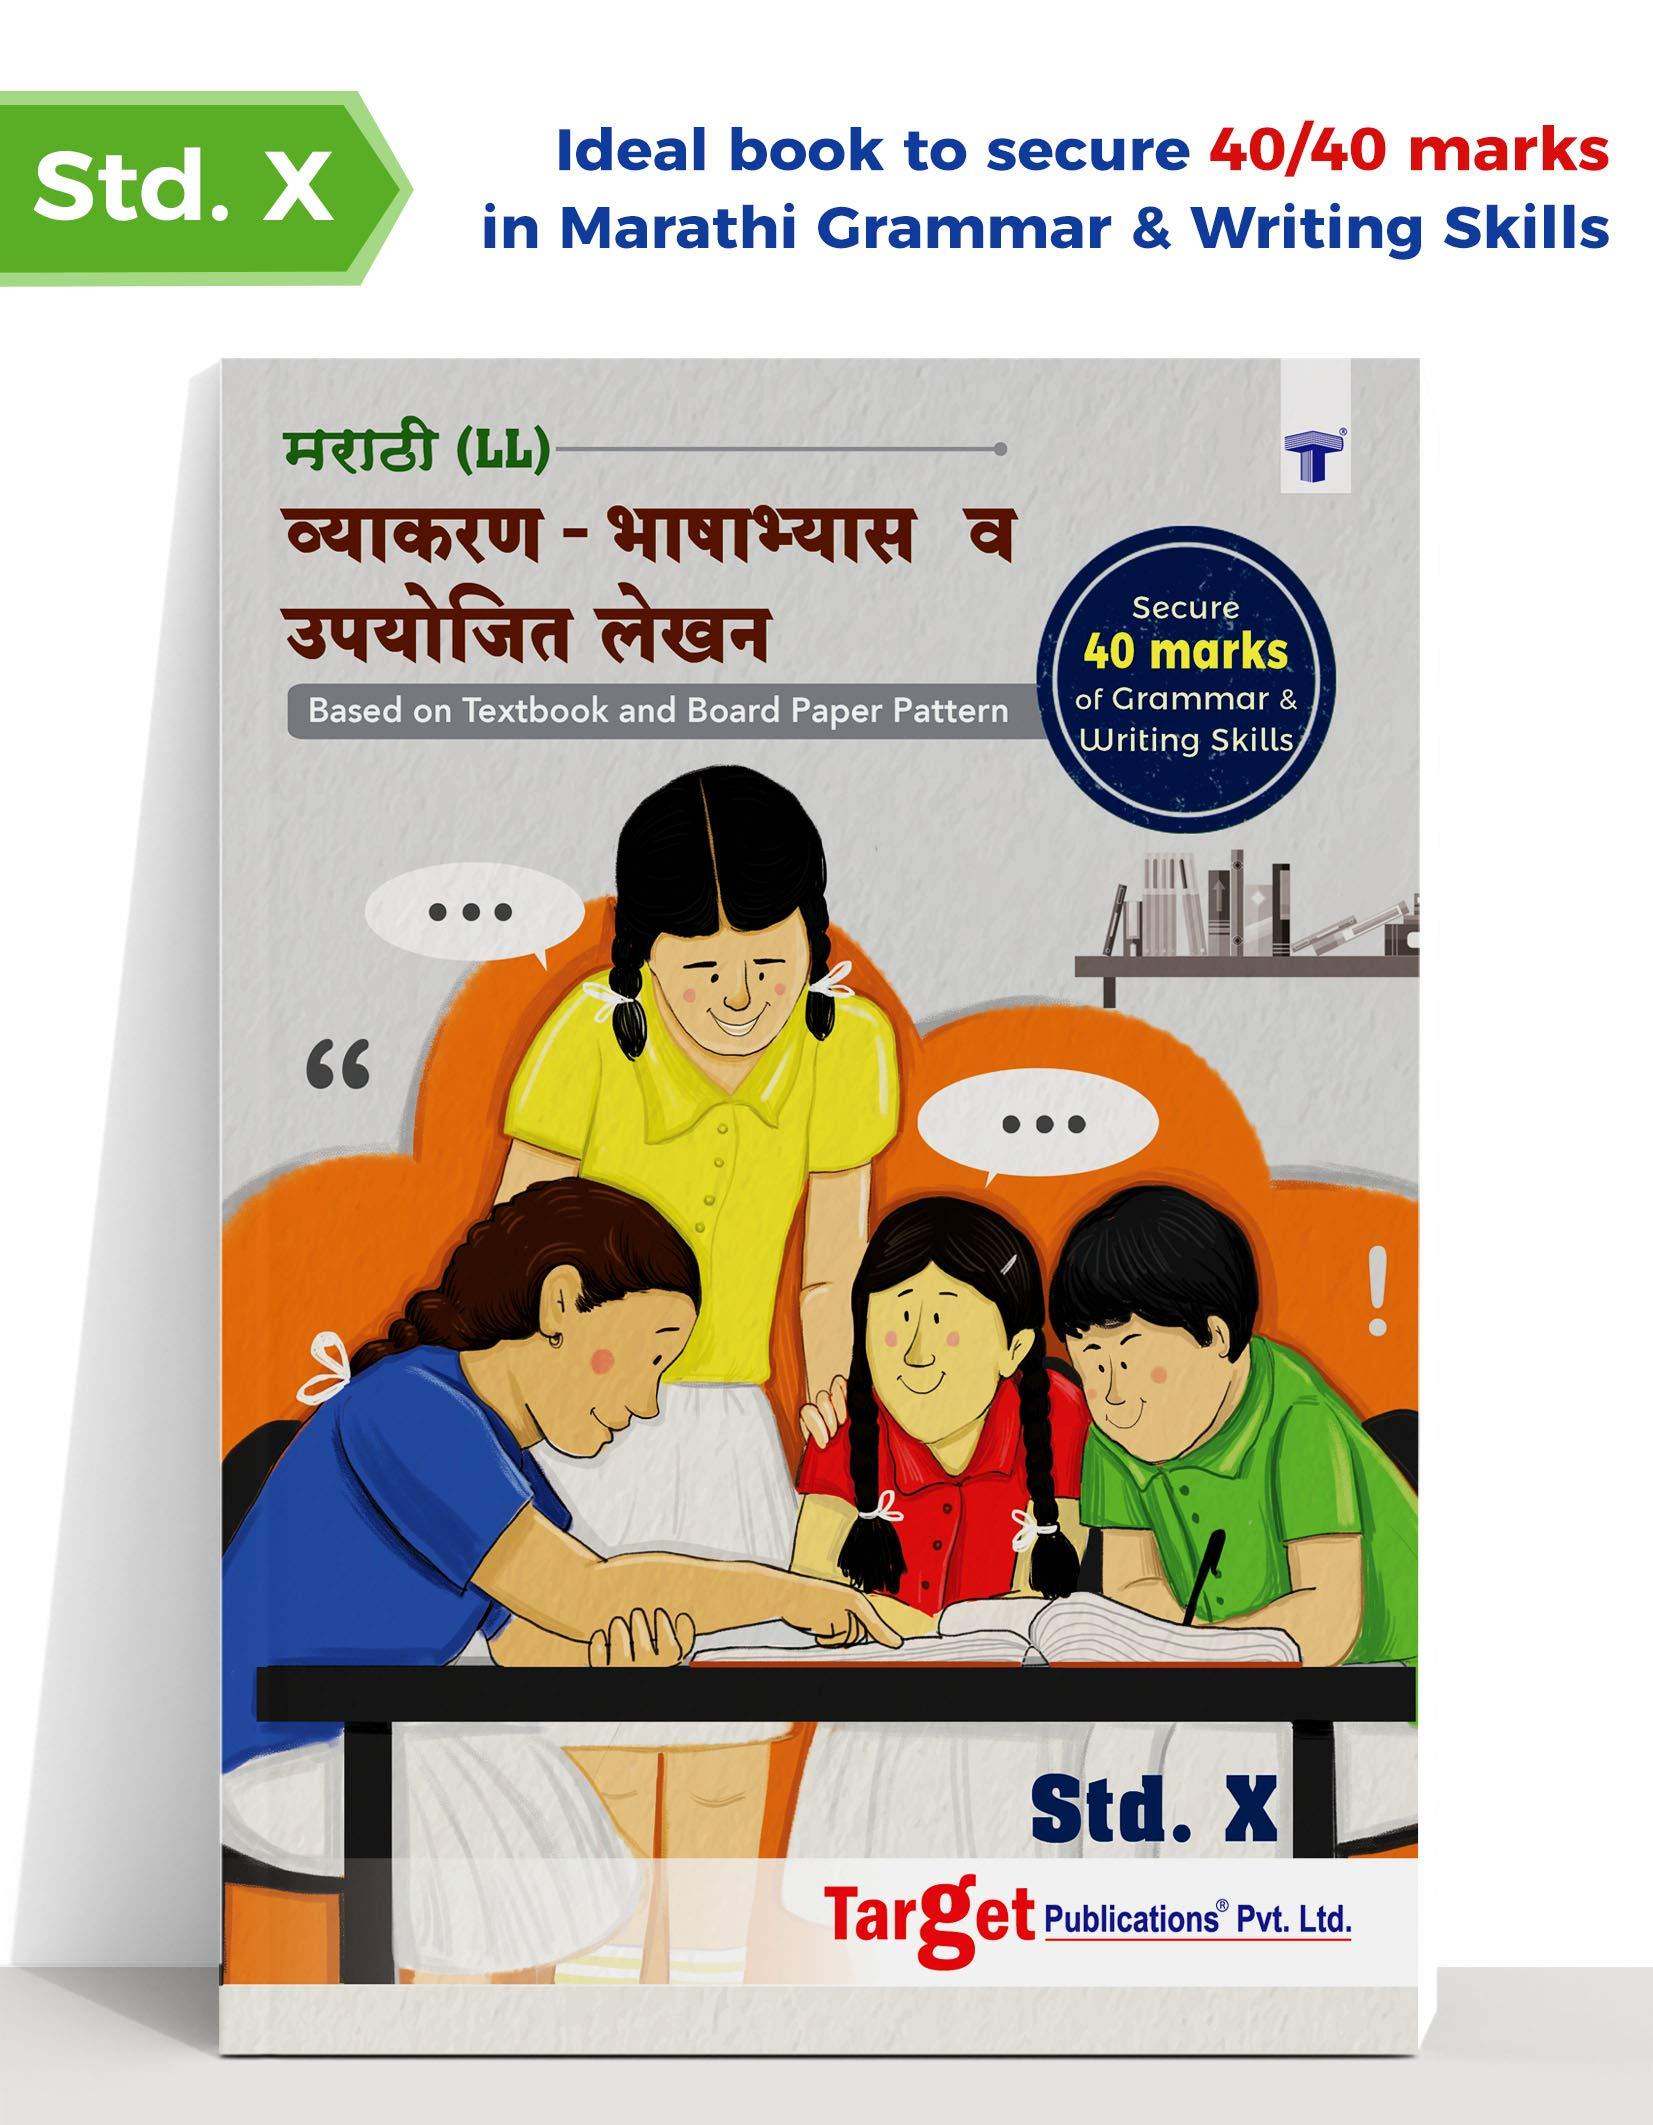 Std 20 Marathi Grammar and Writing Skills Book  Secure 20 Marks ...